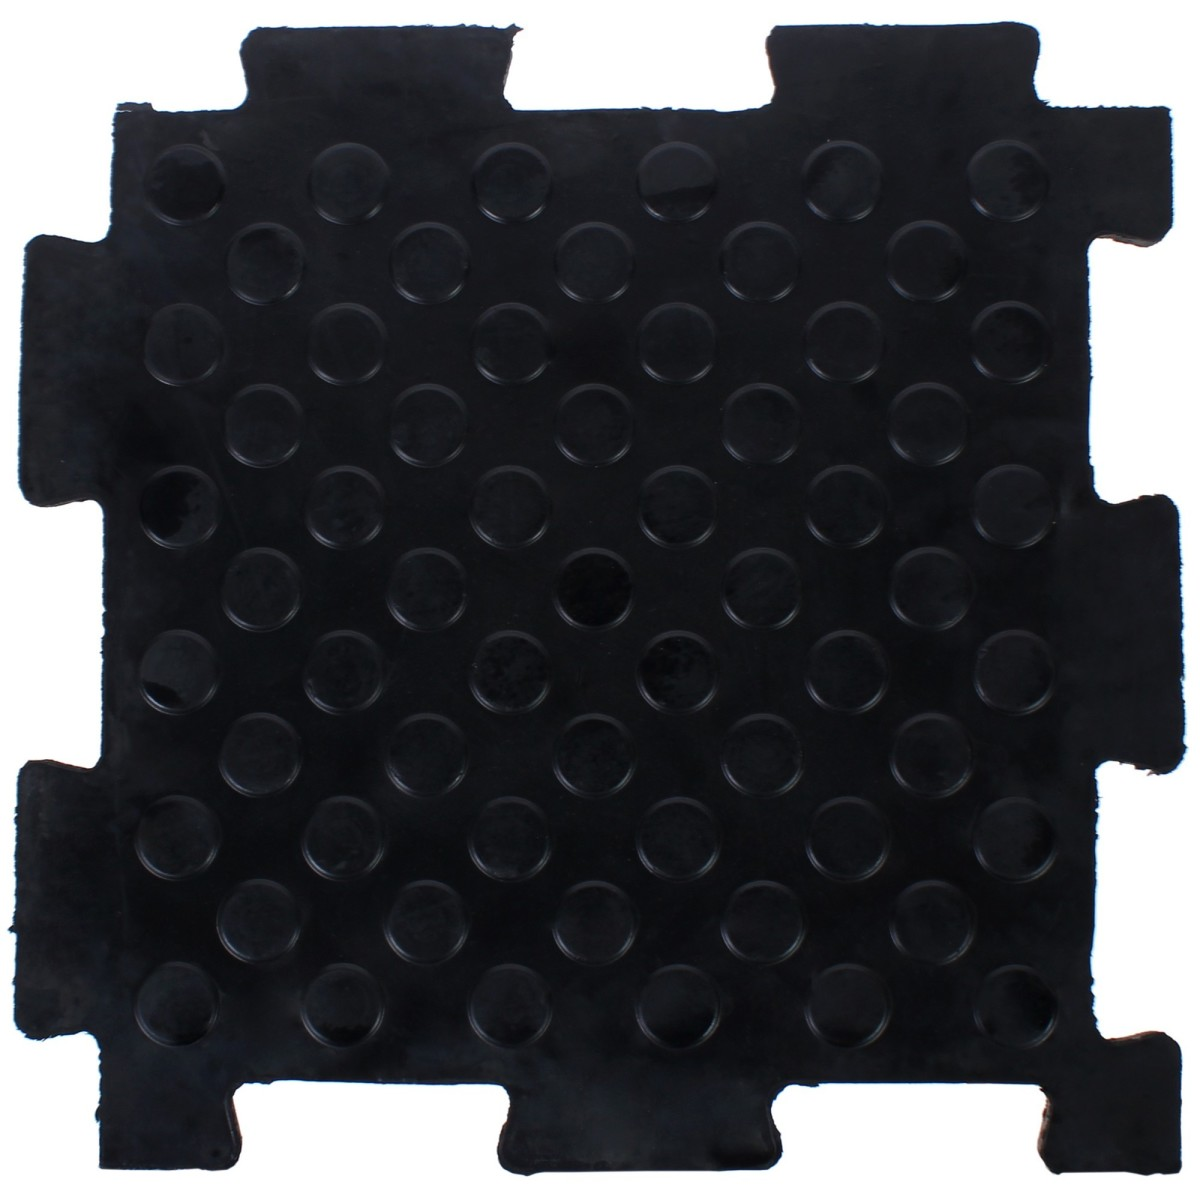 Плитка-пазл резиновая литая 50Х50Х2 см